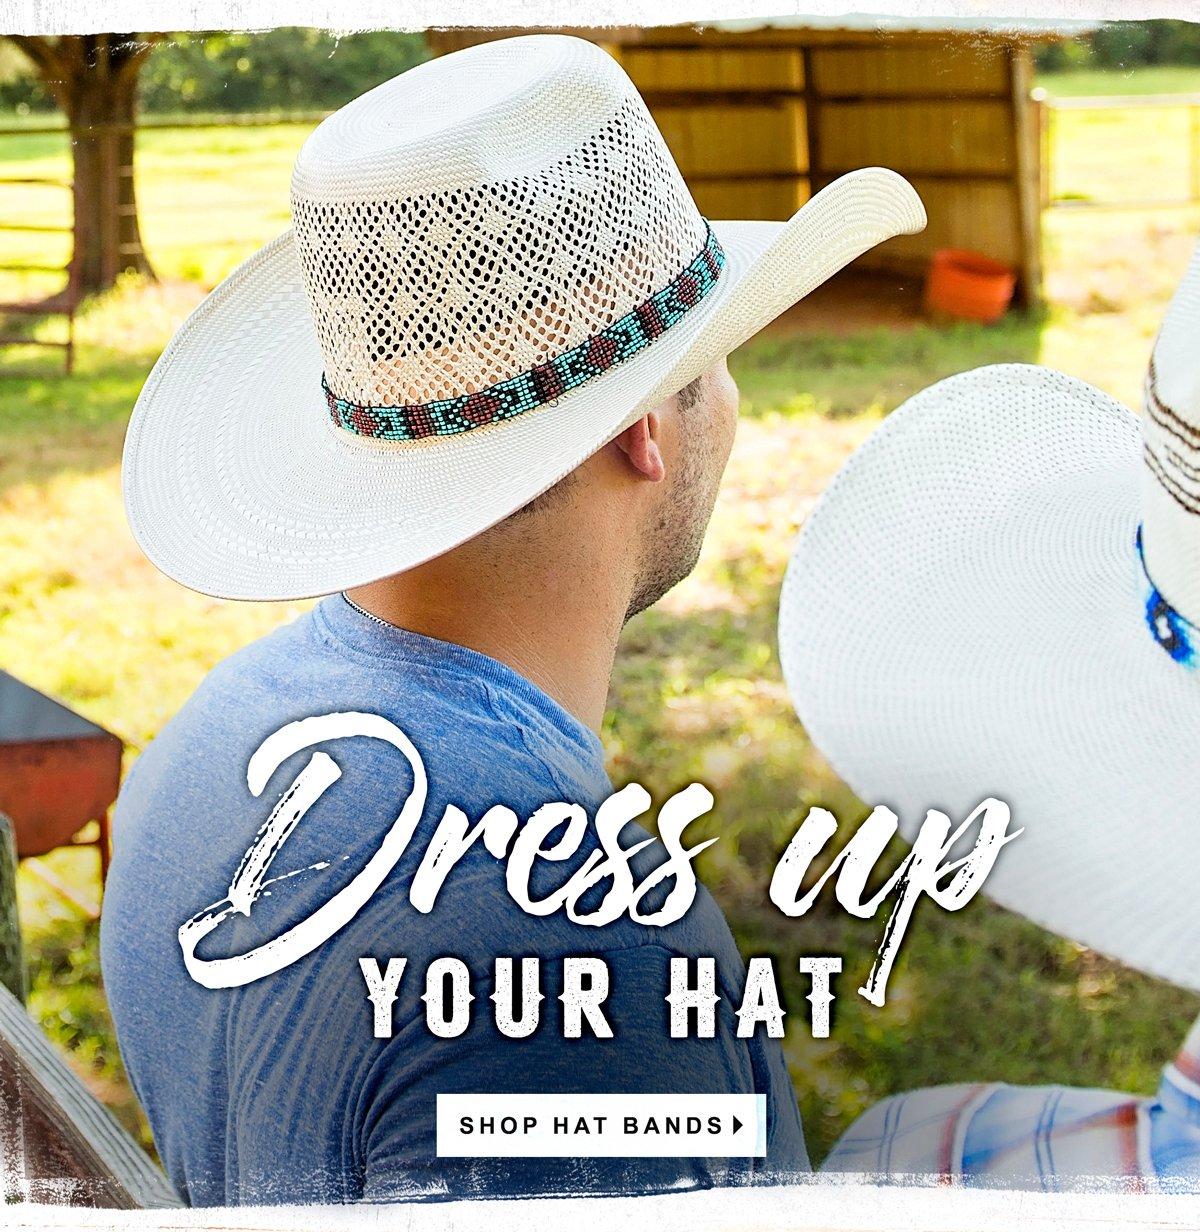 8431f46f7b2 Cavender s   Straw Hats - Shop a Summer Staple